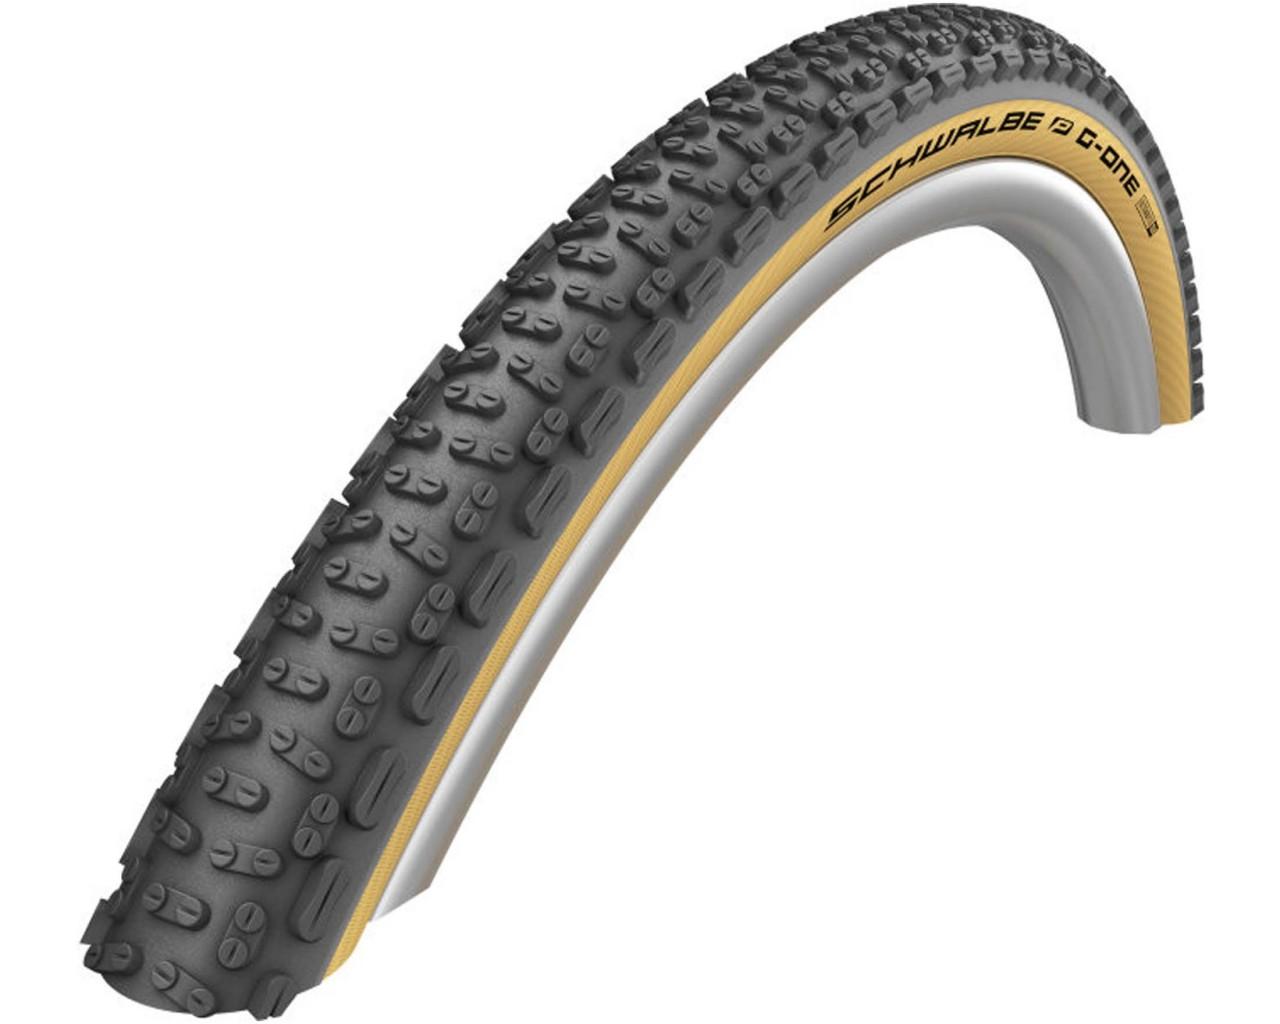 Schwalbe G-One Ultrabite Gravel-Reifen 28x2.00 Zoll   schwarz ADDIX Performance Line faltbar